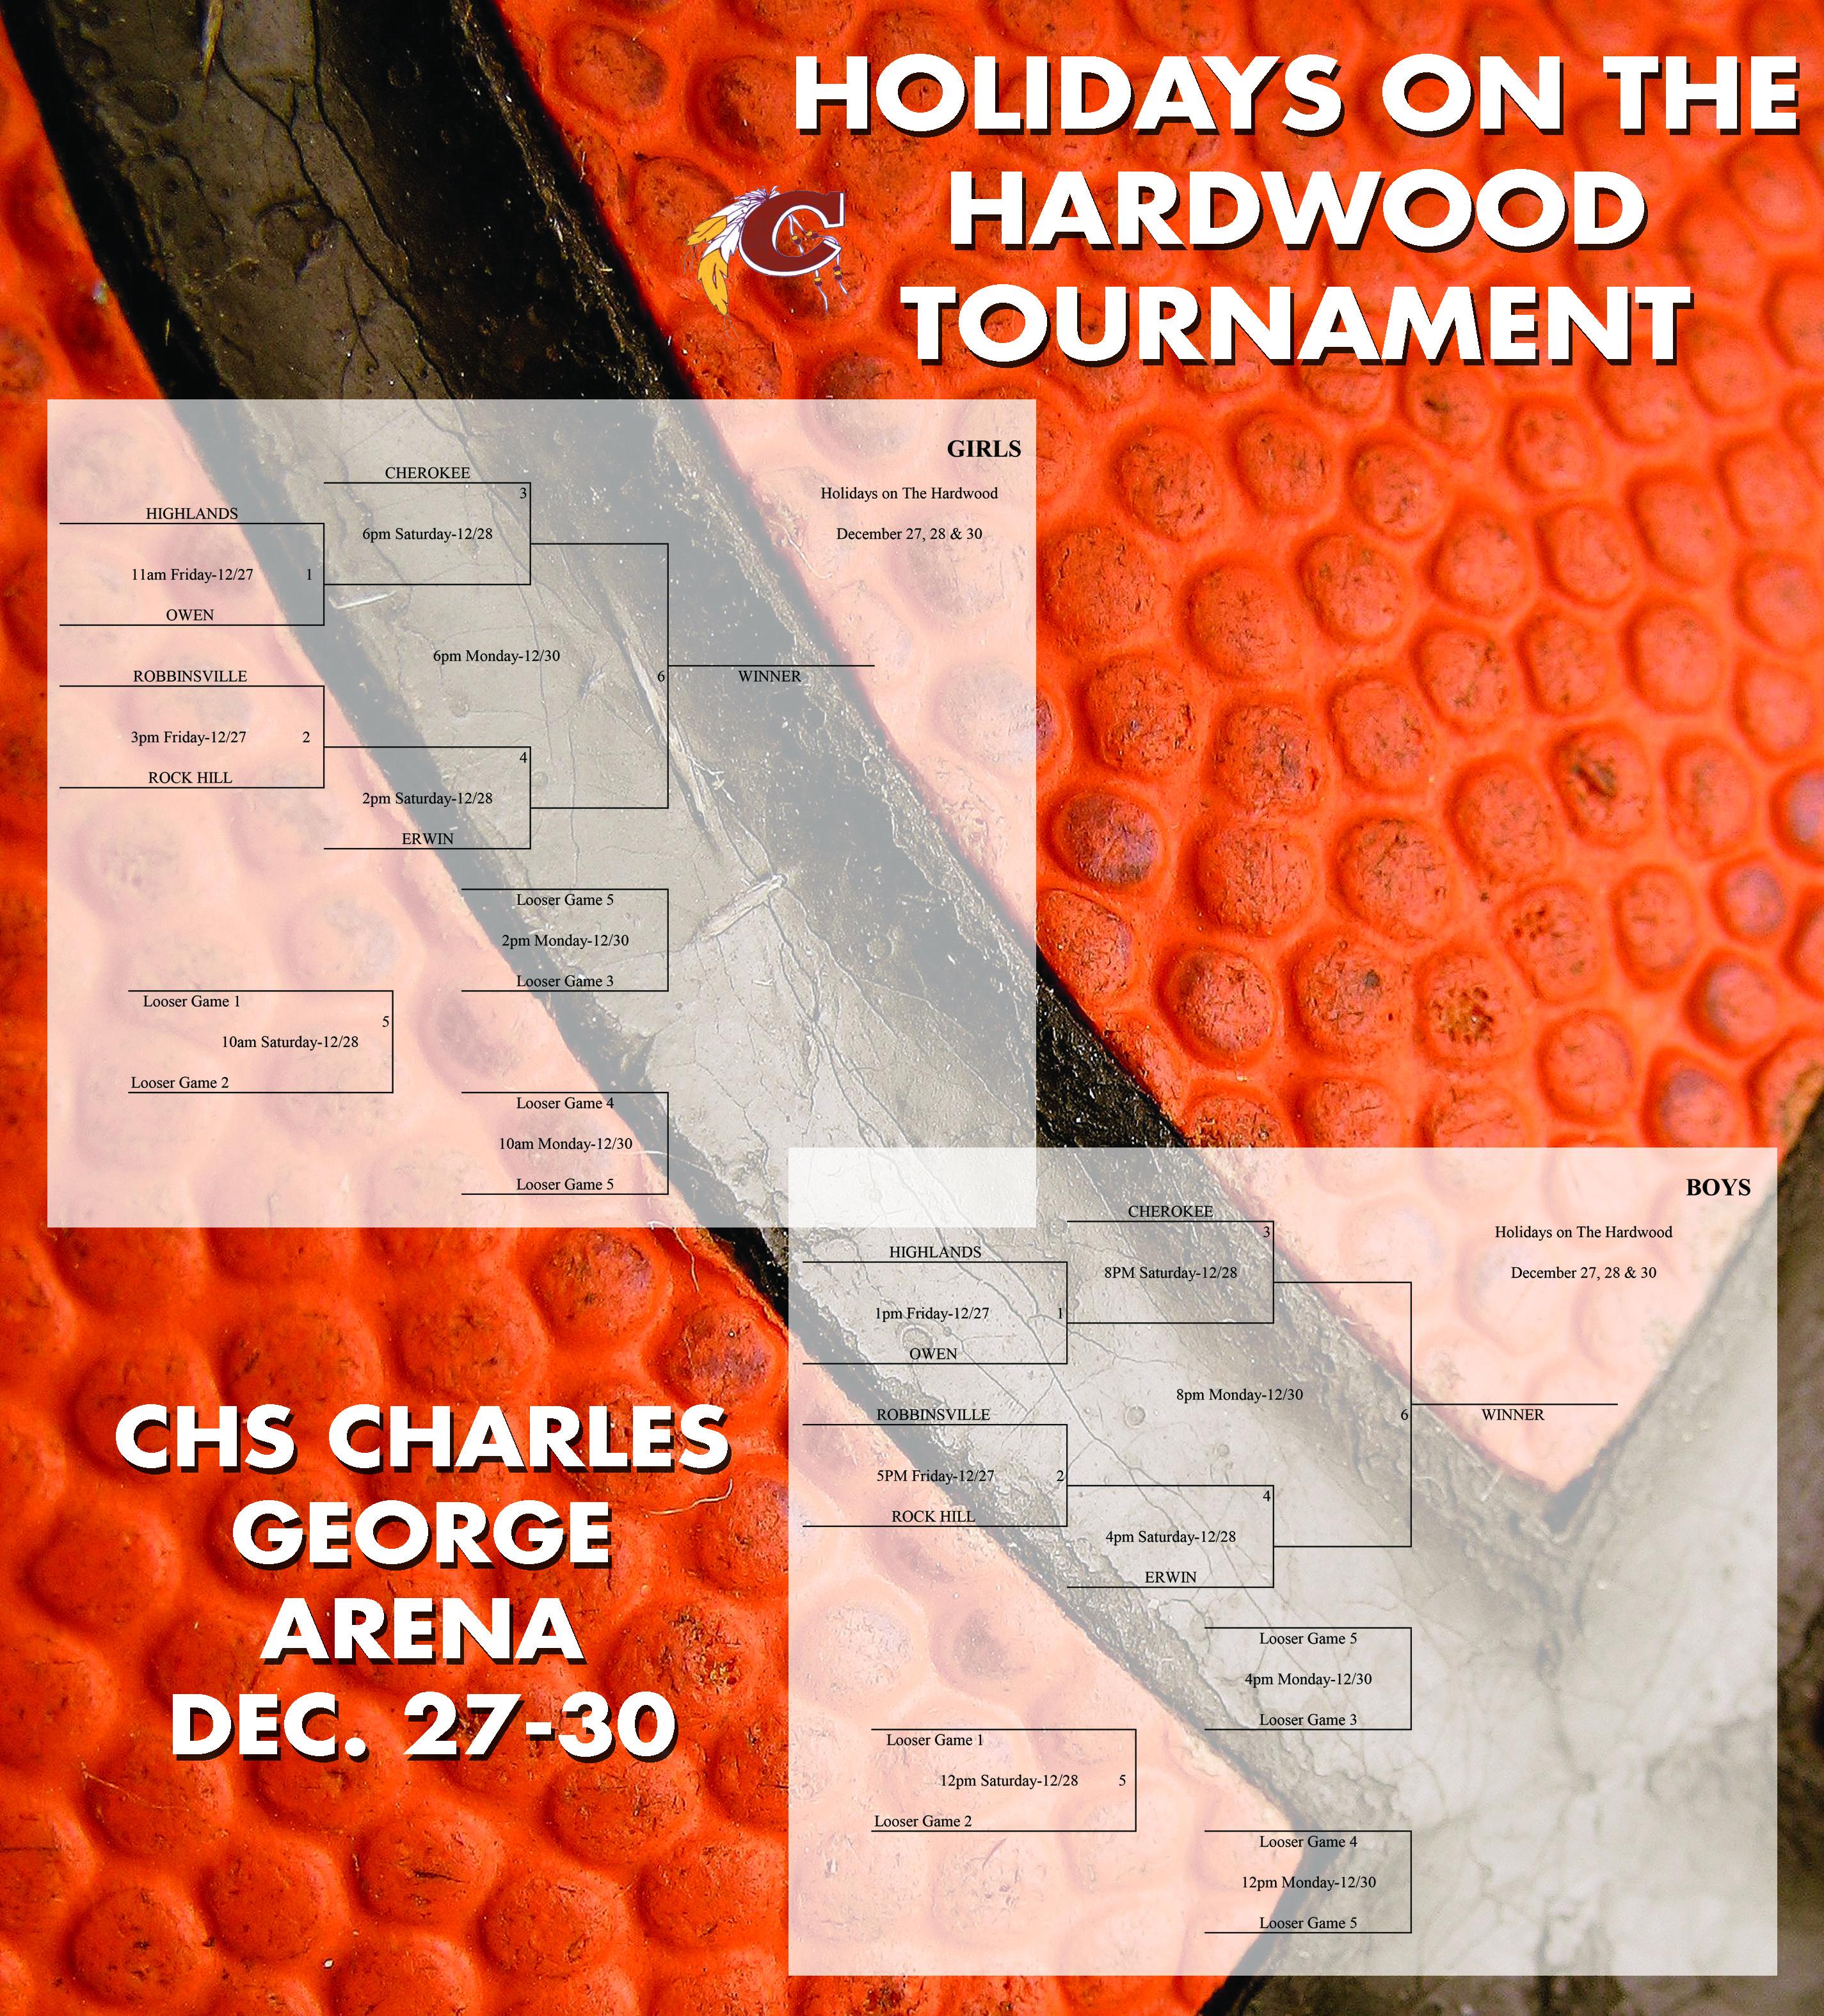 Holidays on the Hardwood Tournament flyer